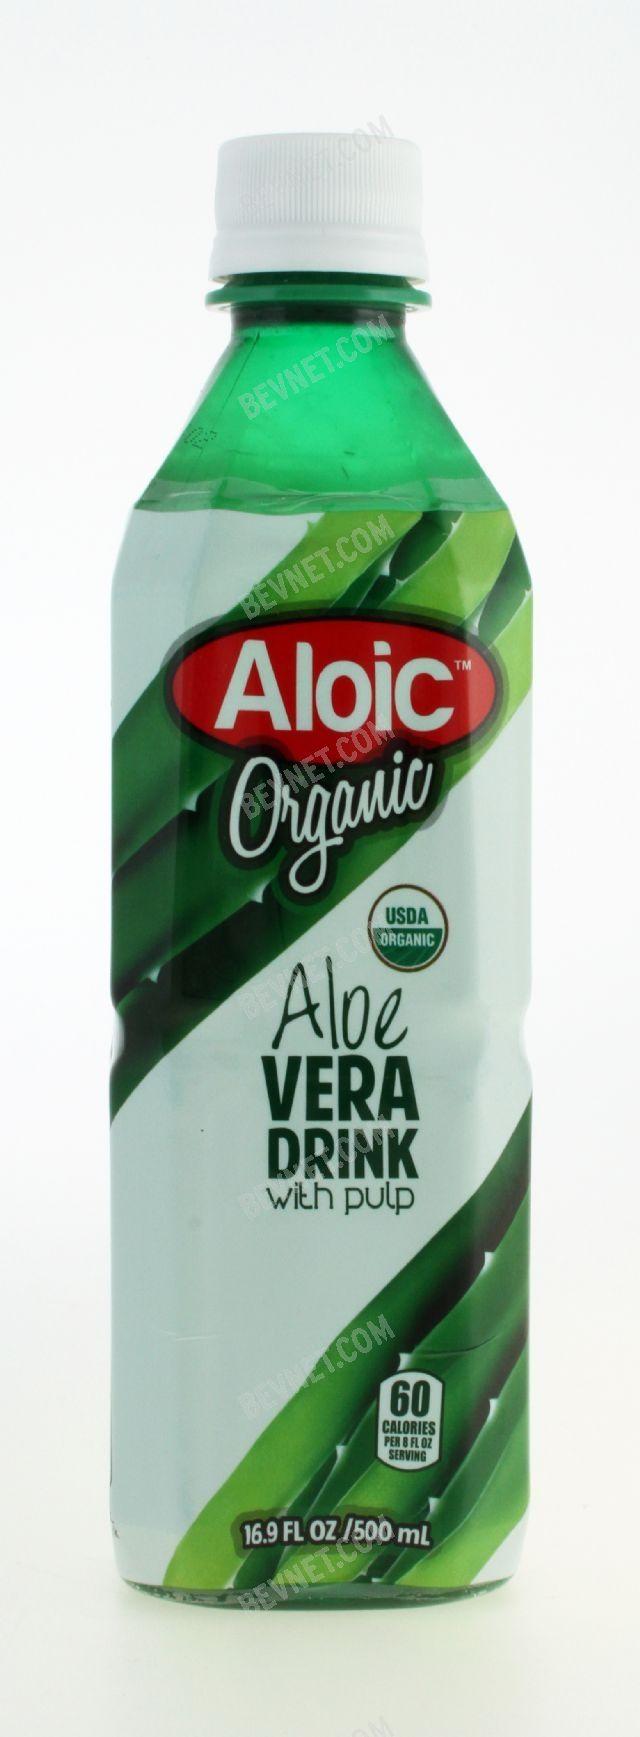 Aloic: